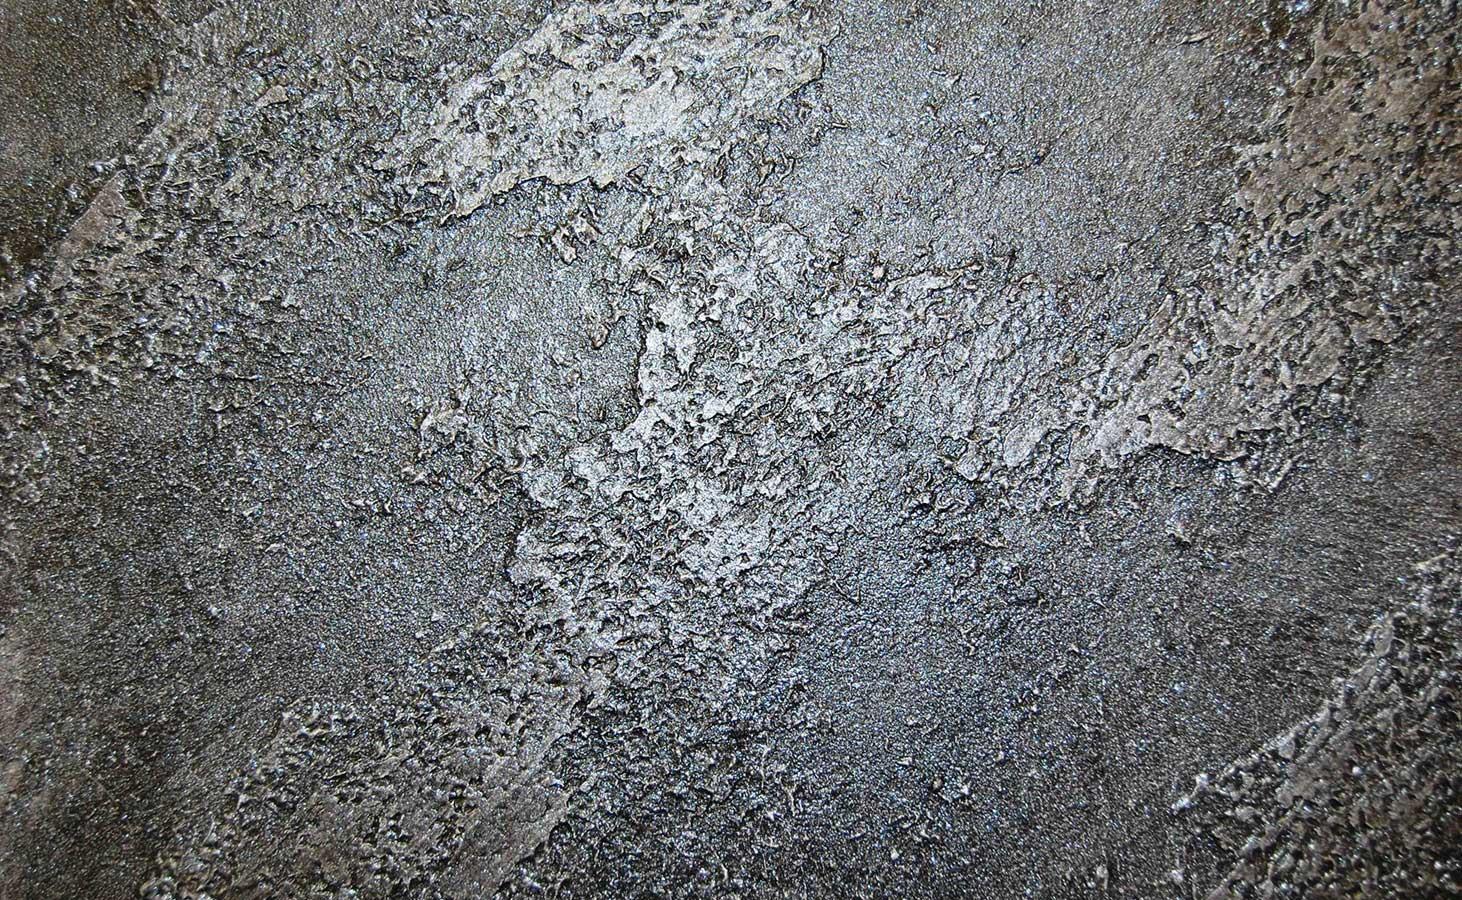 Encausto applied by Trowel